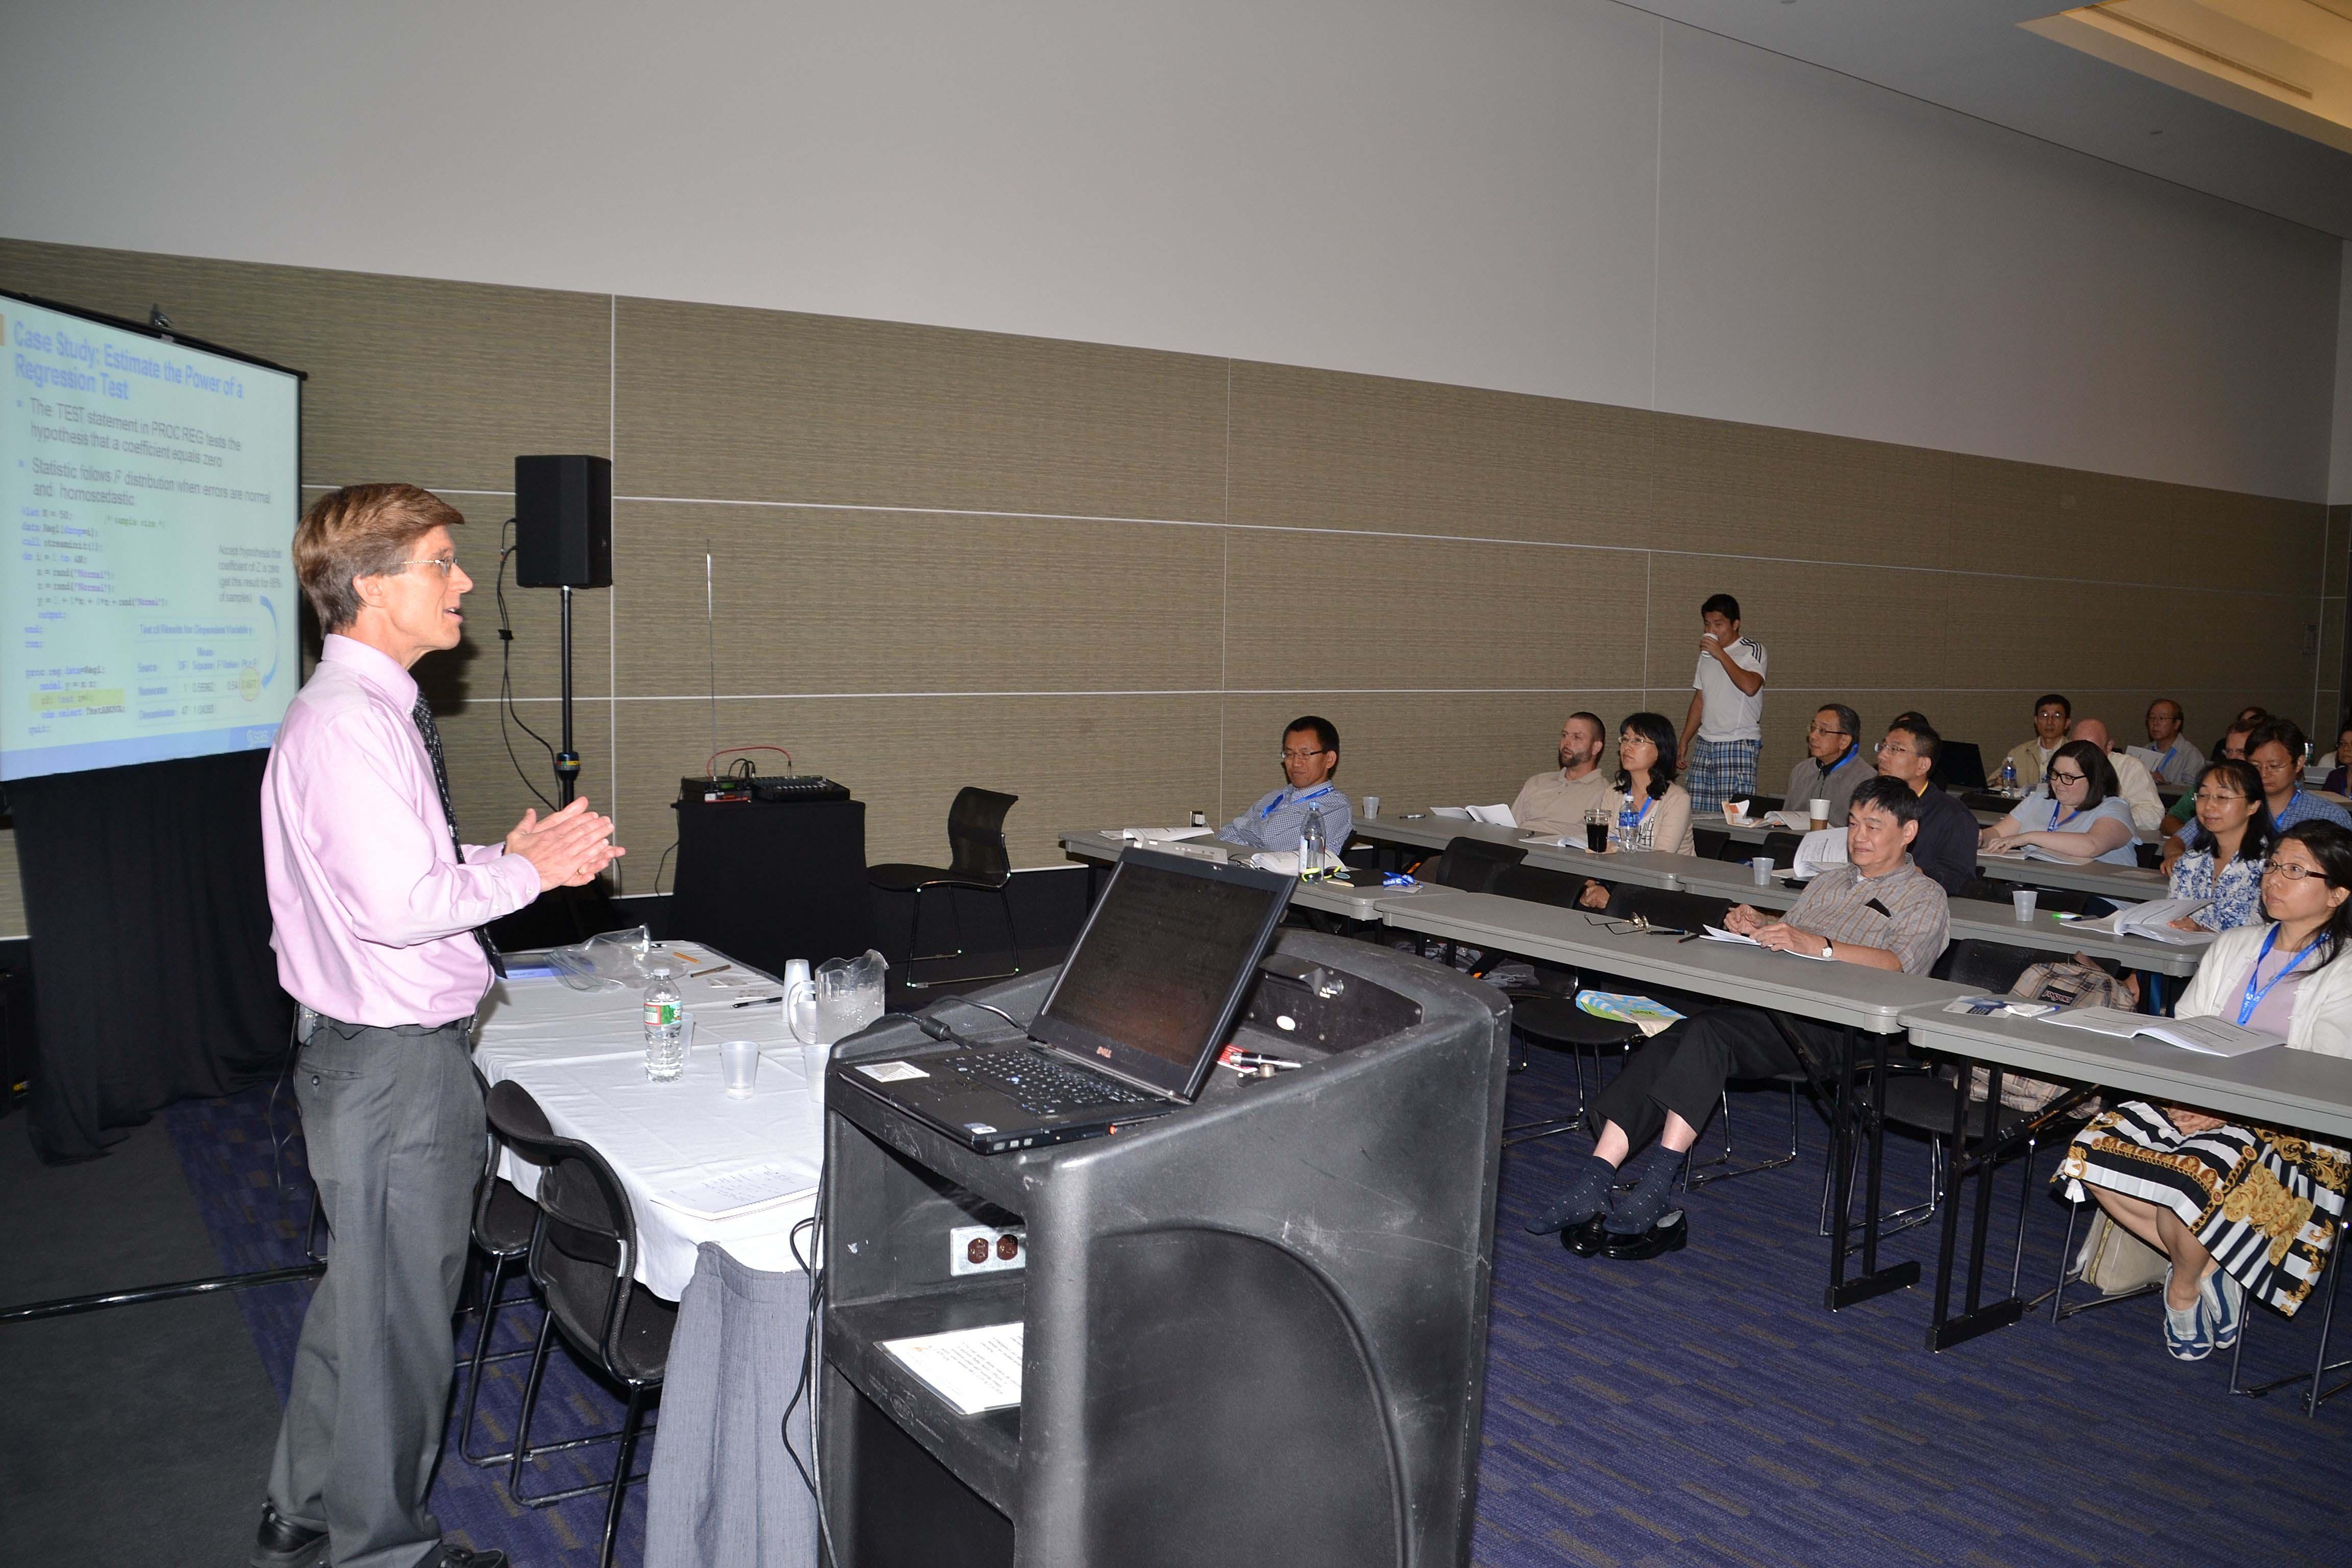 Rick Wicklin teaches Continuing Ed: Techniques for Simulating Data in SAS